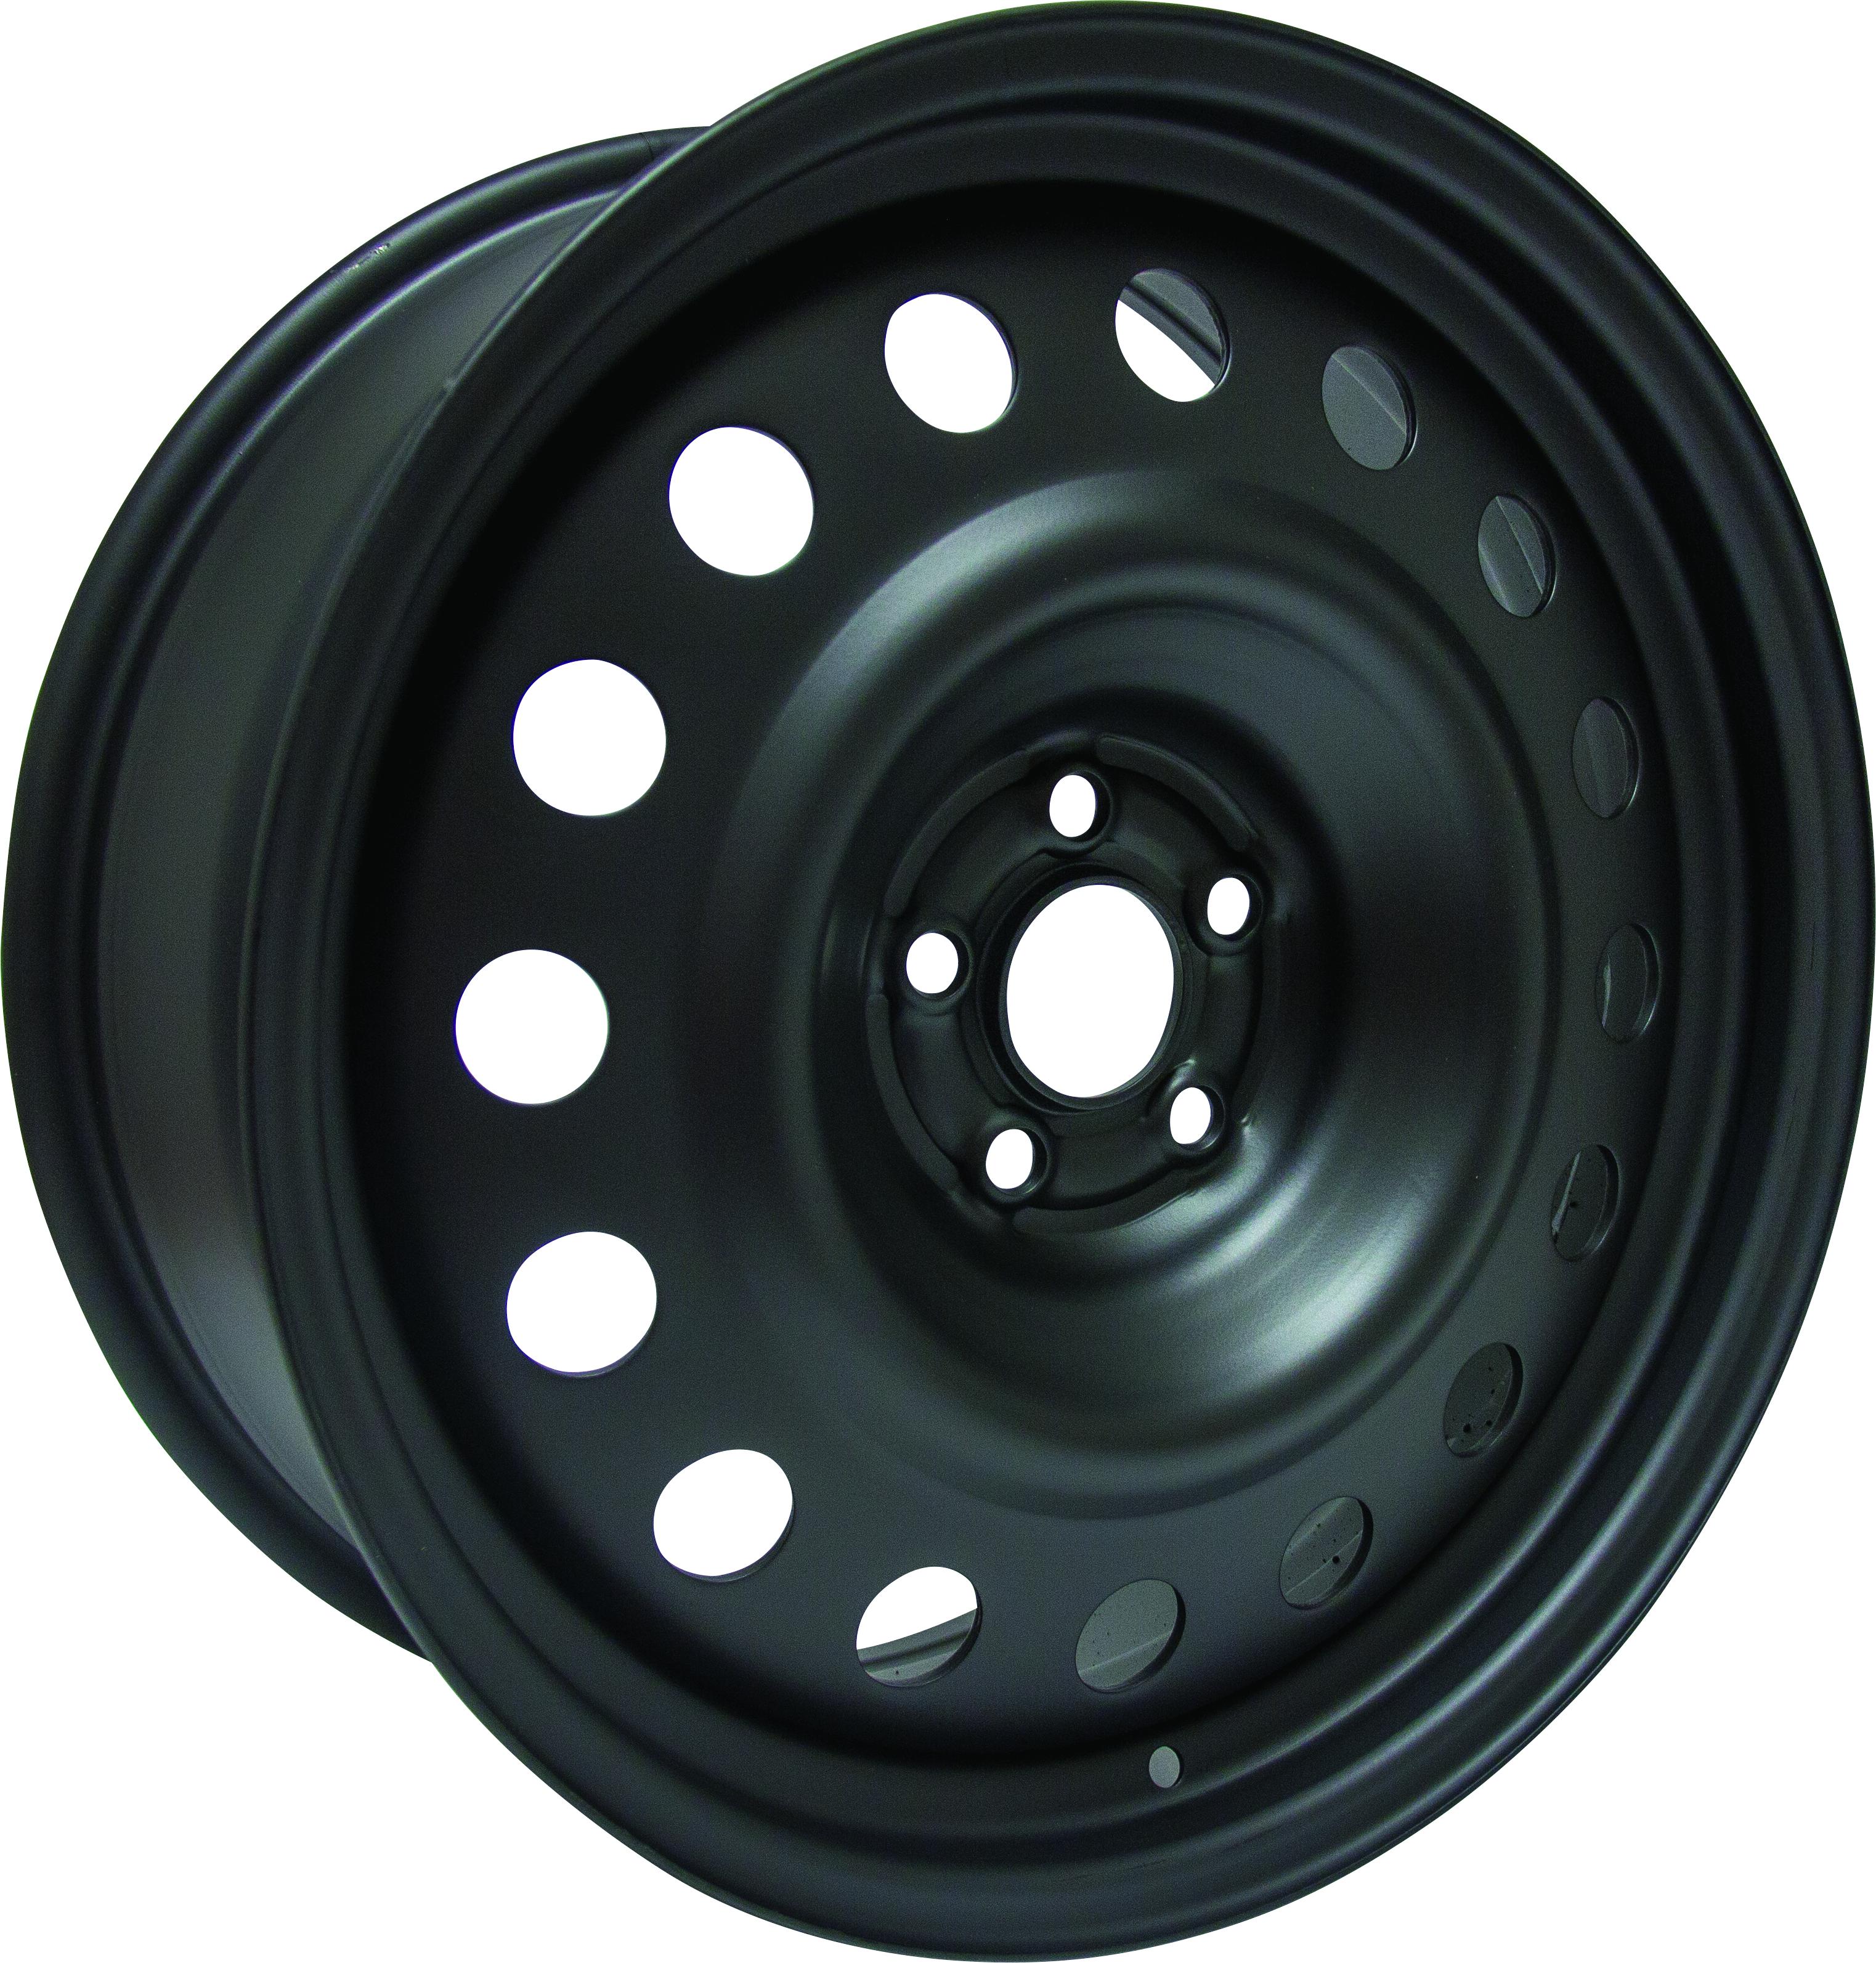 Subaru Crosstrek 2018 Wheels